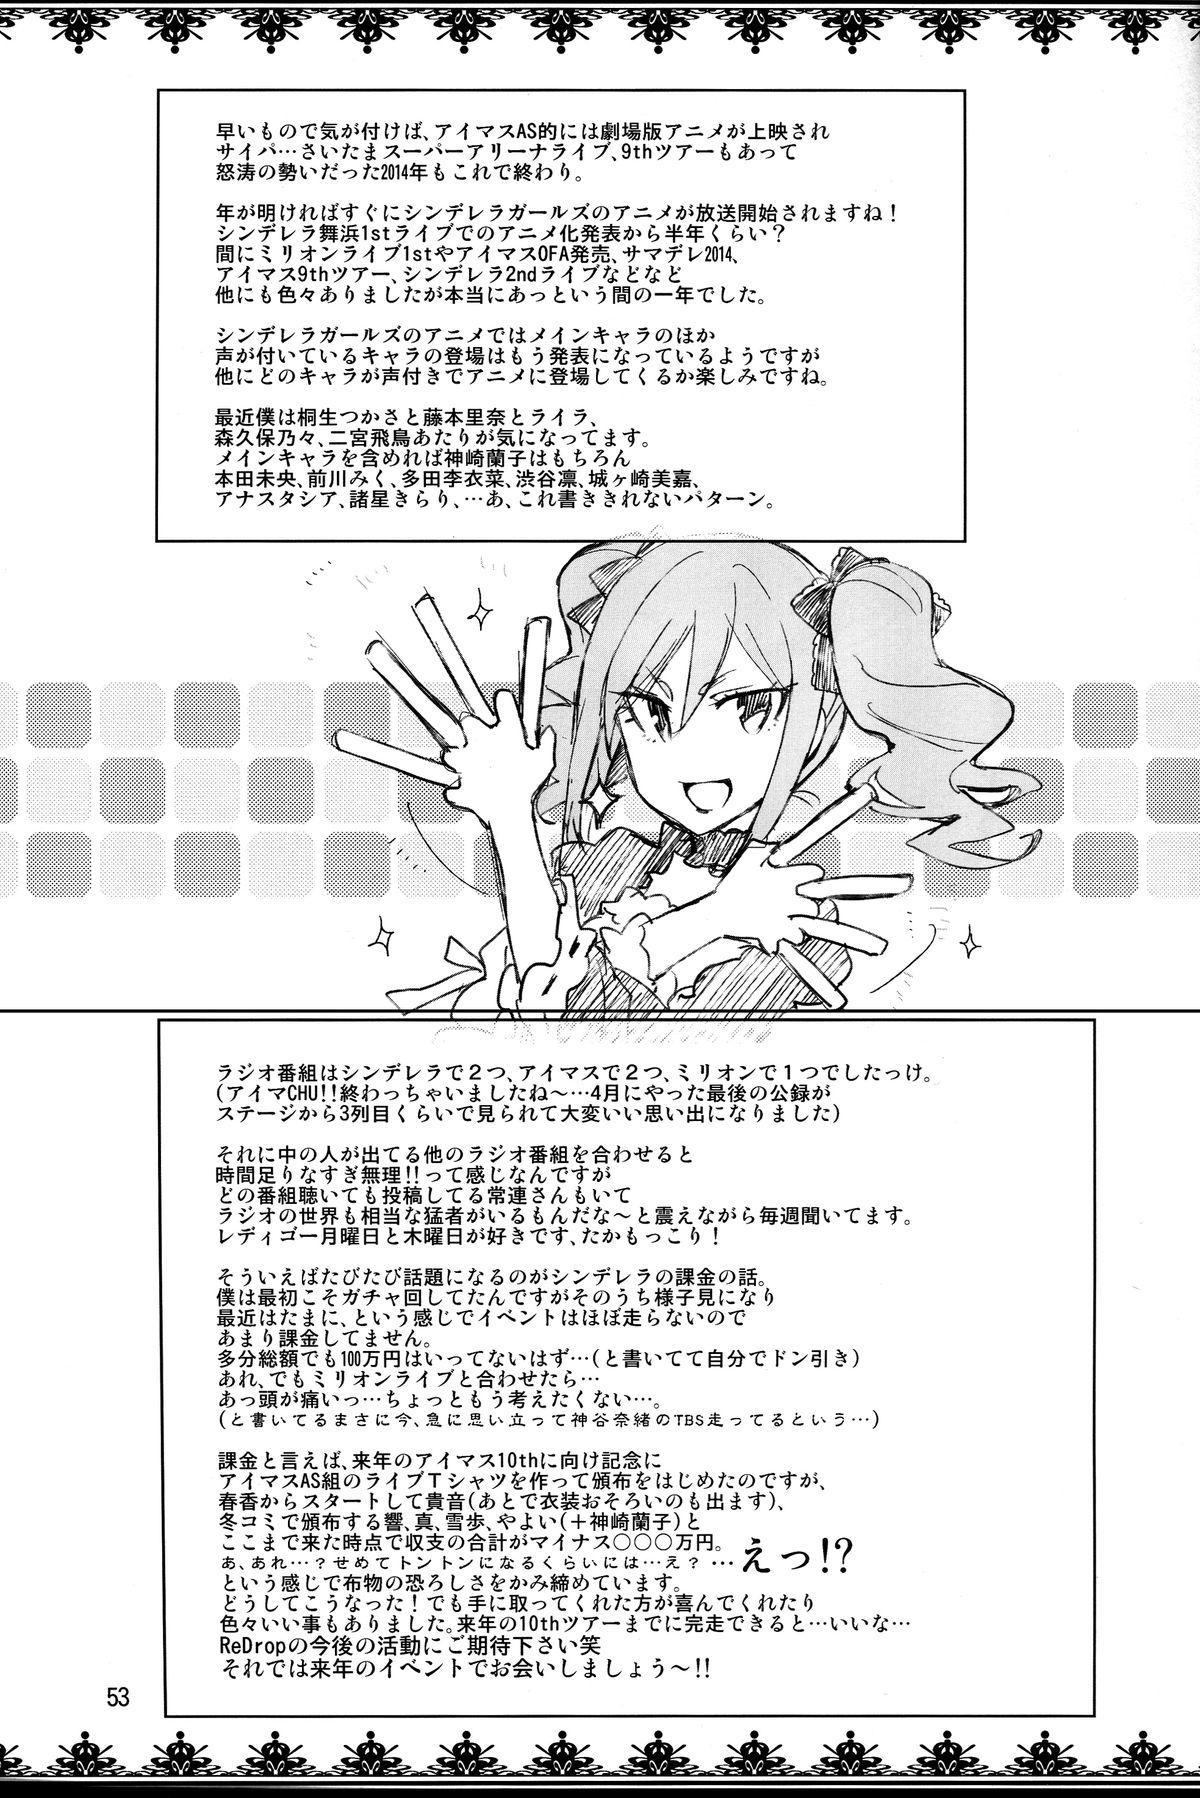 (C87) [ReDrop (Miyamoto Smoke, Otsumami)] Cinderella, After the Ball ~Boku no Kawaii Ranko~ | Cinderella After the Ball - My Cute Ranko (THE IDOLM@STER CINDERELLA GIRLS) [English] [doujin-moe.us] 50